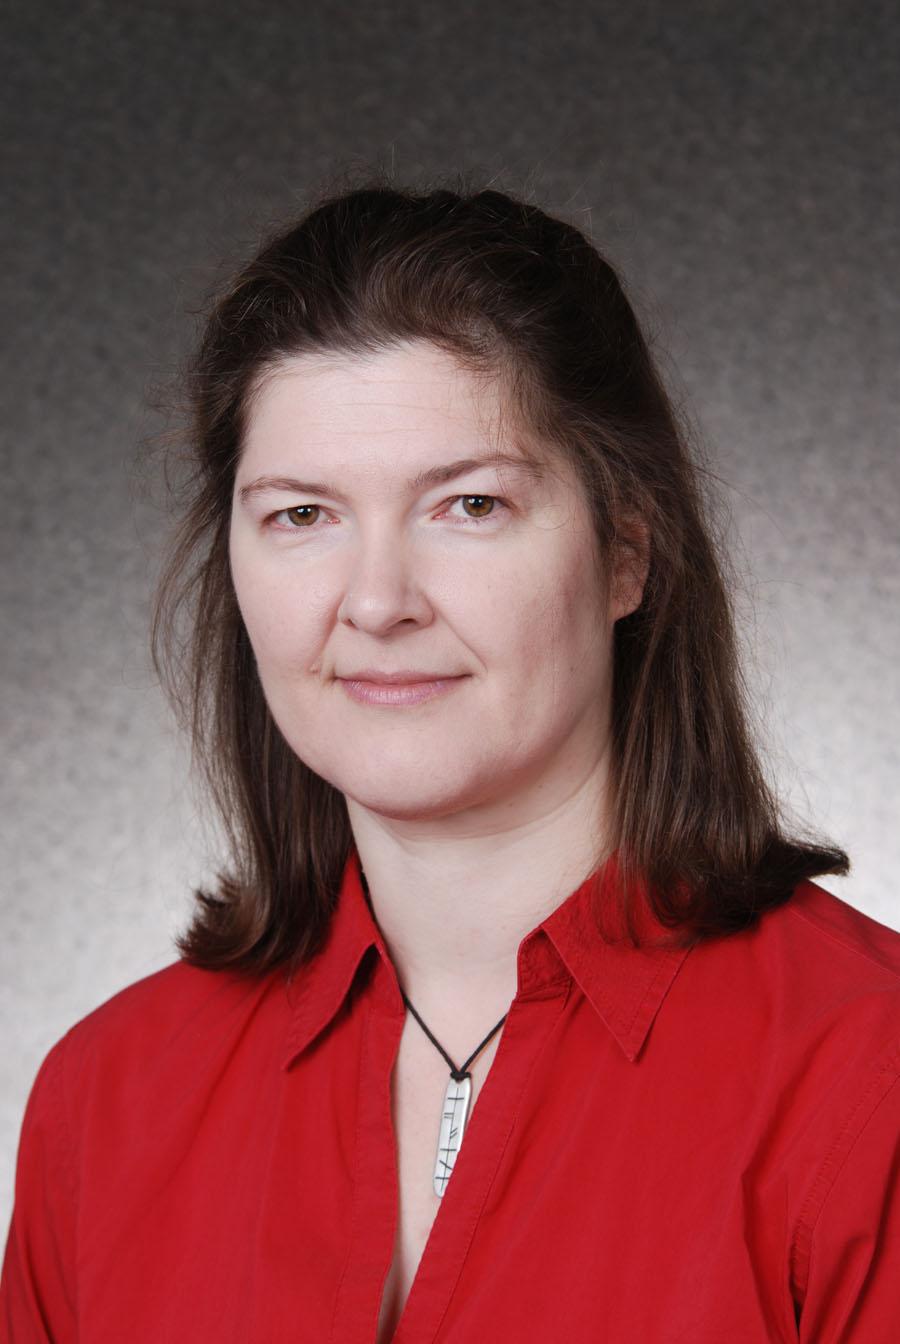 Dr. Amanda Charlesworth